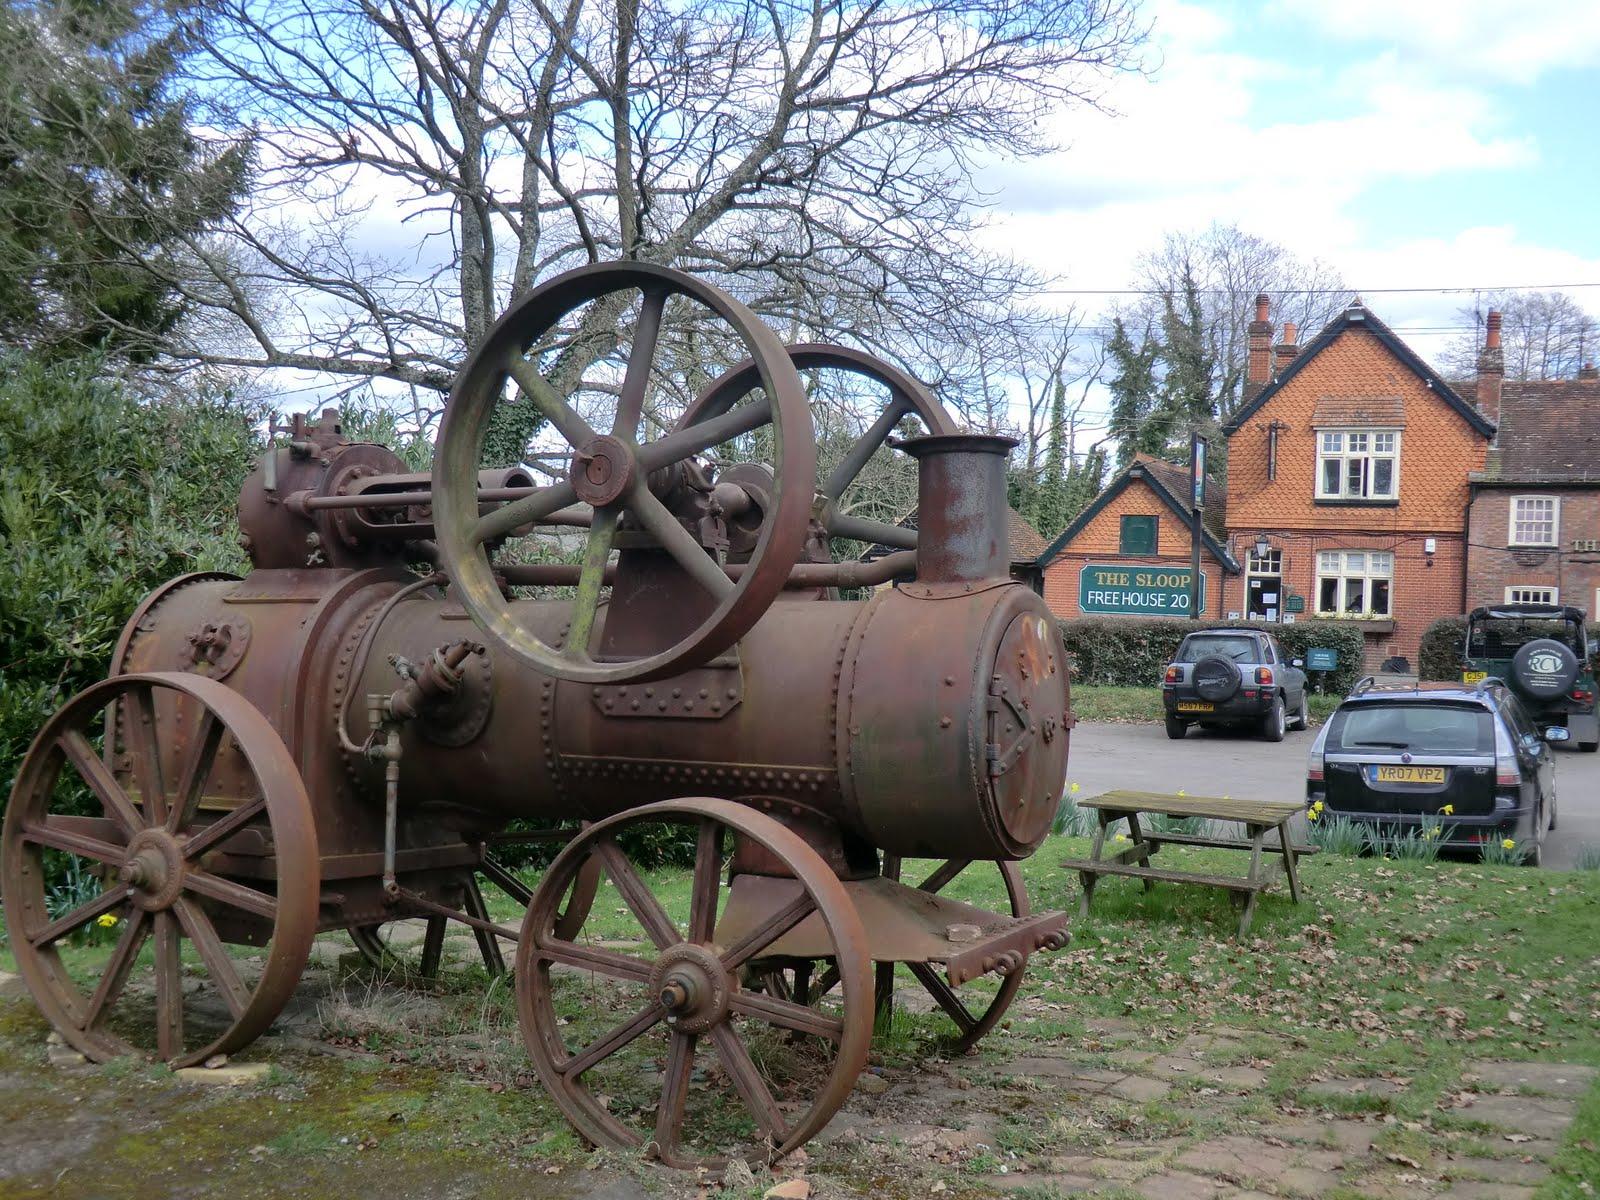 CIMG1825 Industrial relic at The Sloop